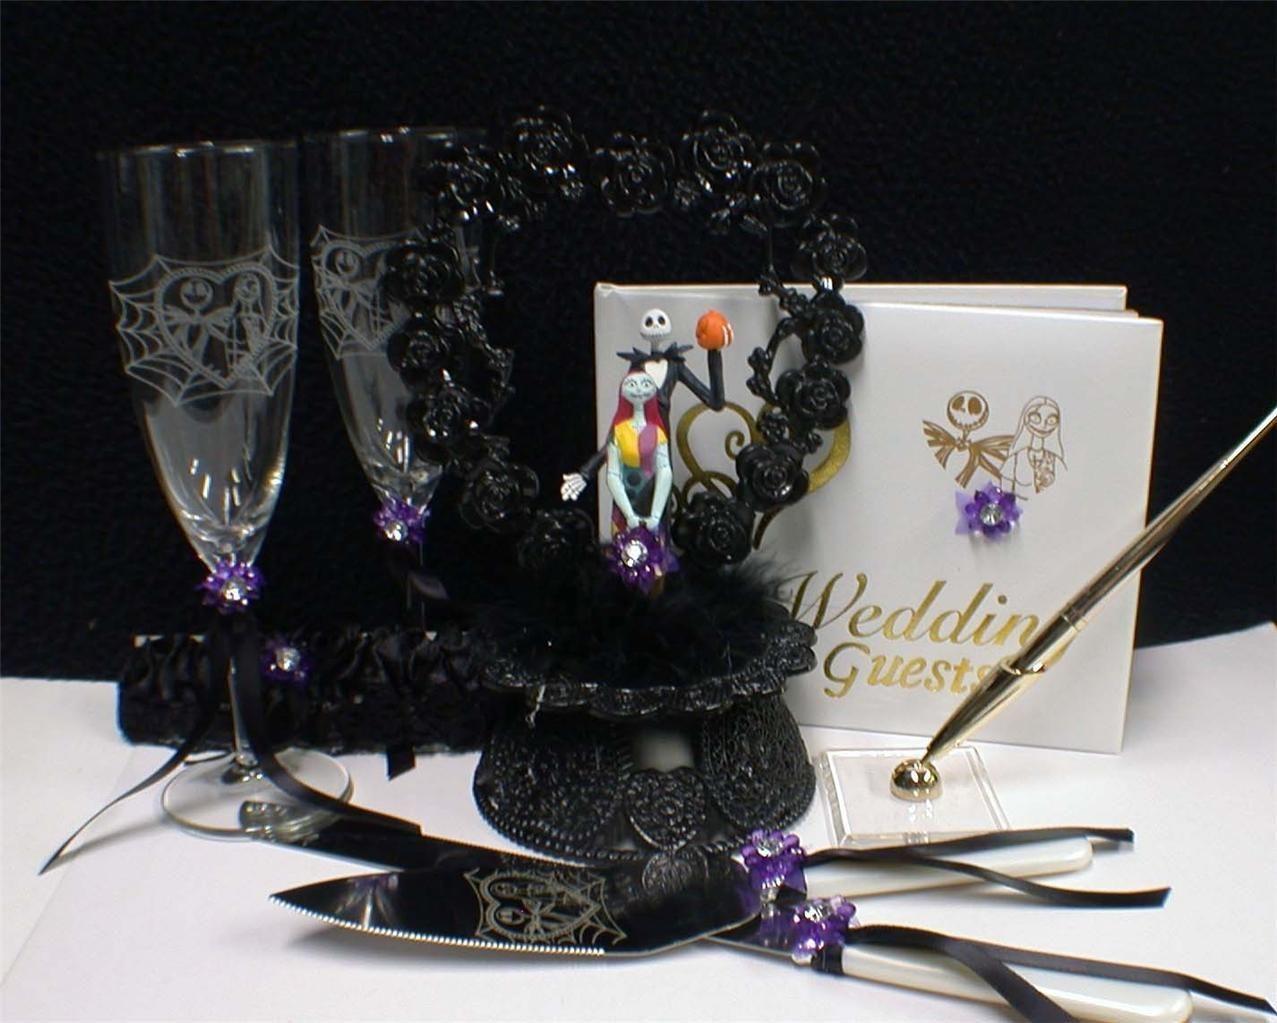 nightmare before christmas wedding theme | wedding cake toppers ...